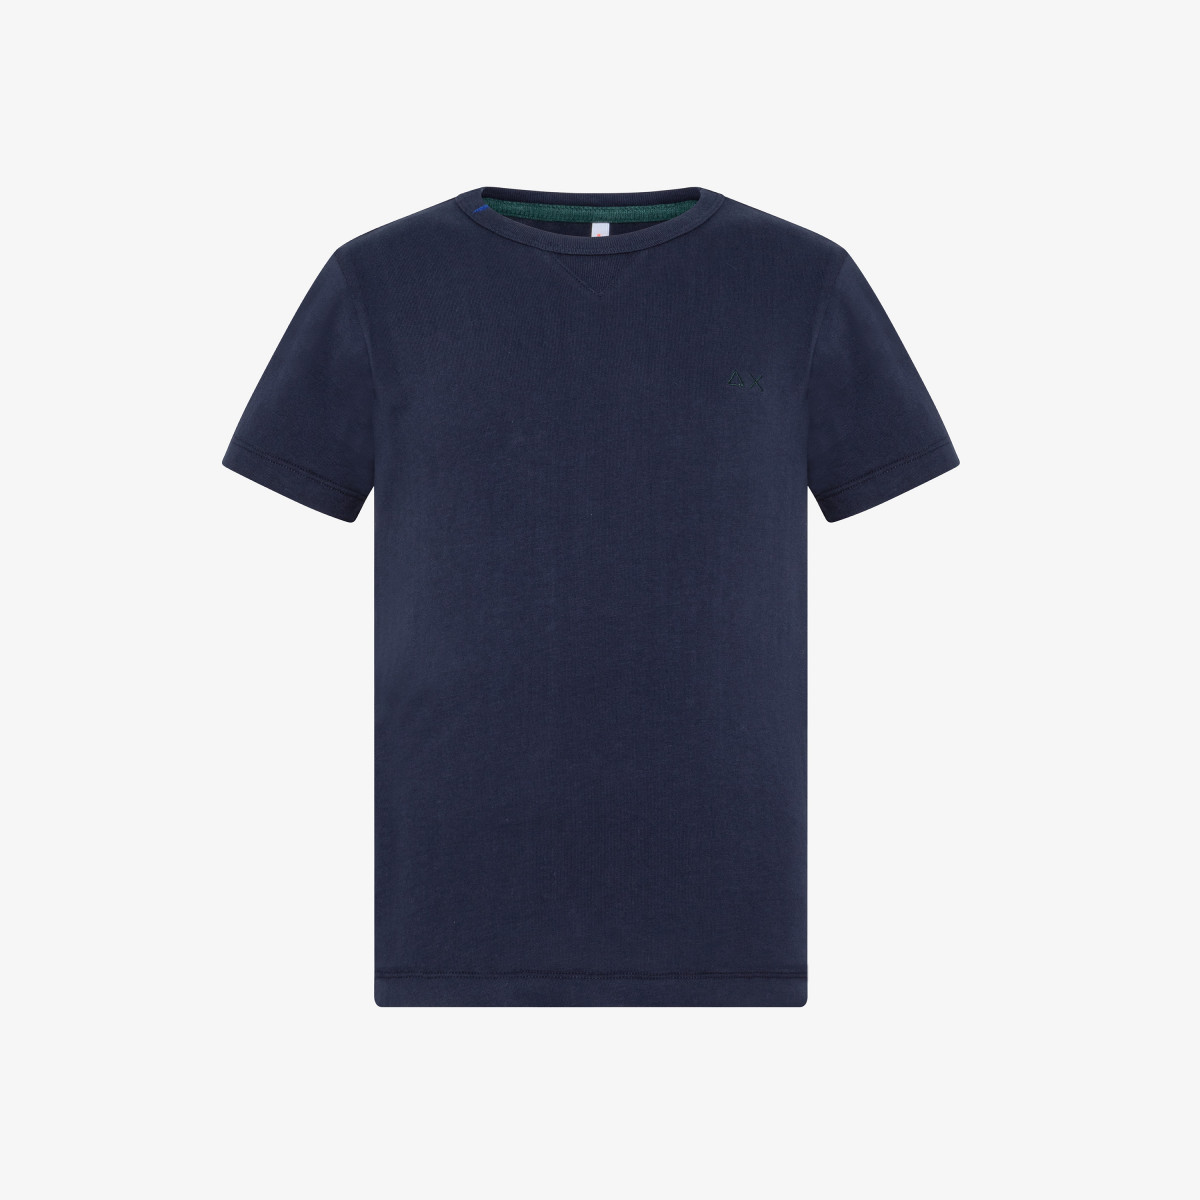 BOY'S ROUND T-SHIRT NIKI S/S NAVY BLUE